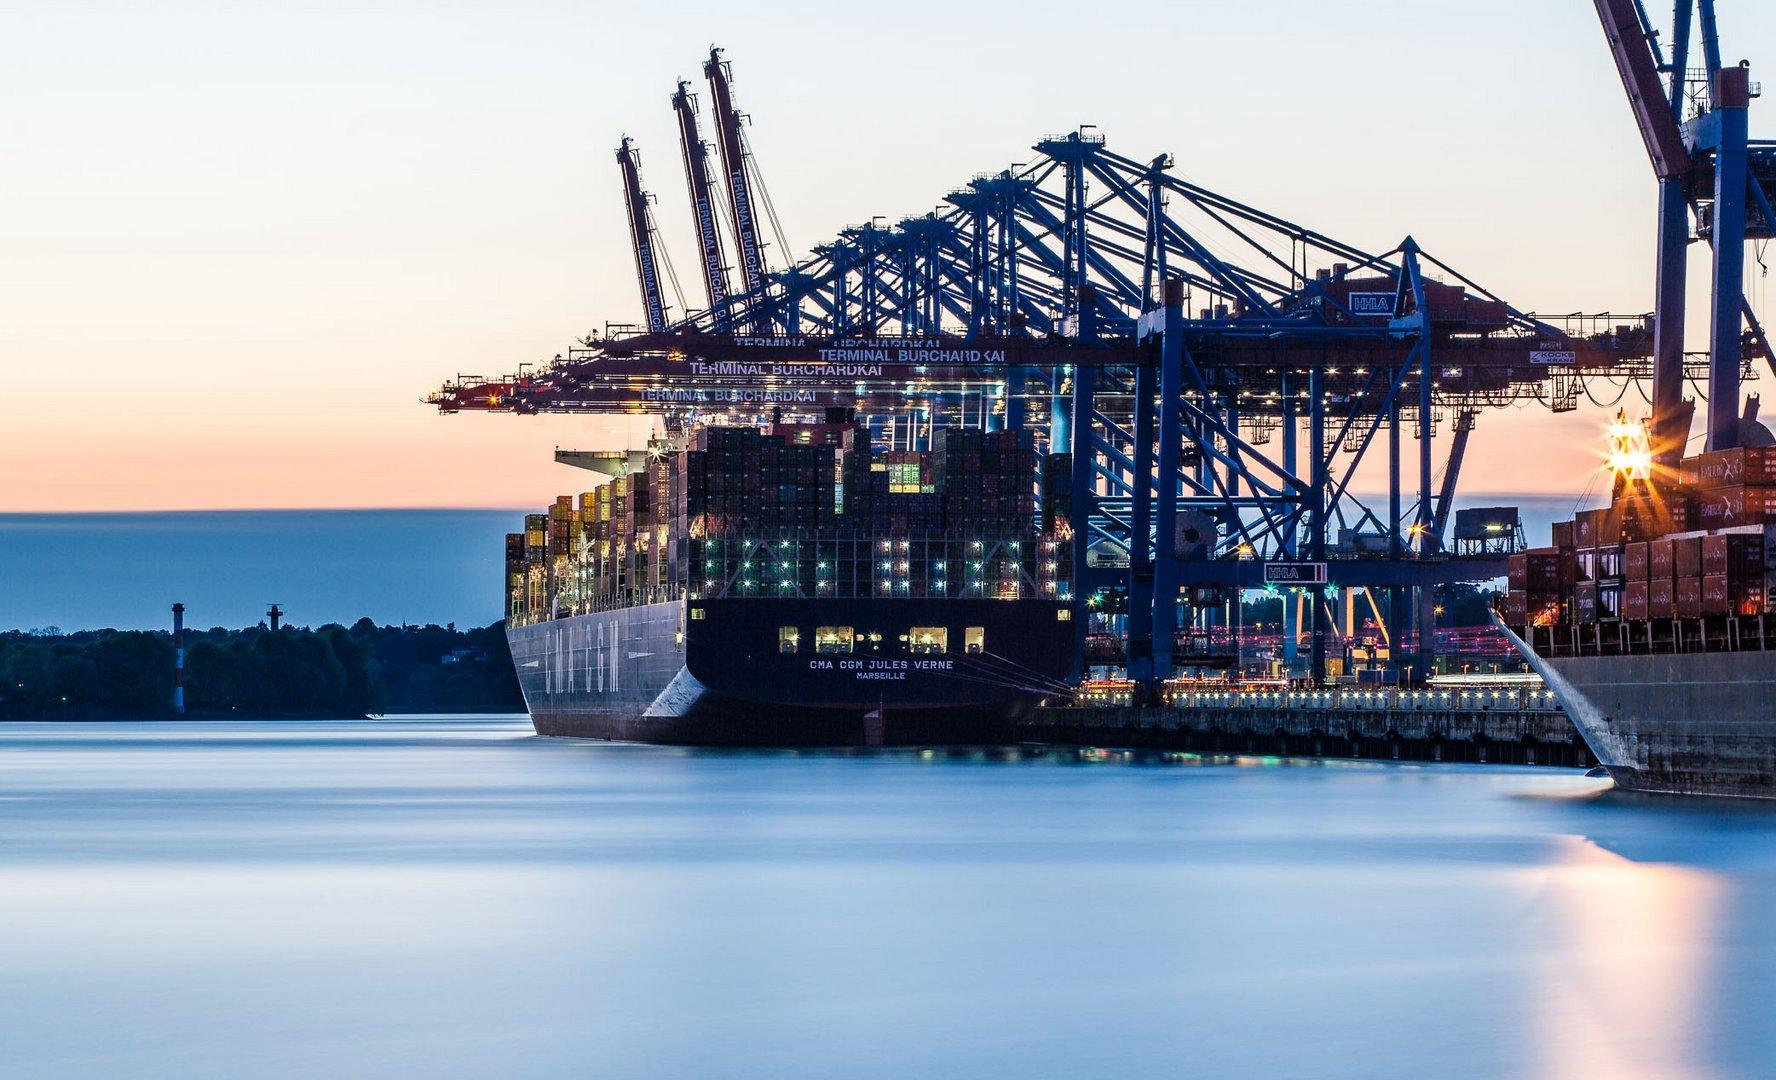 CMA CGM Jules Verne im Hamburger Hafen